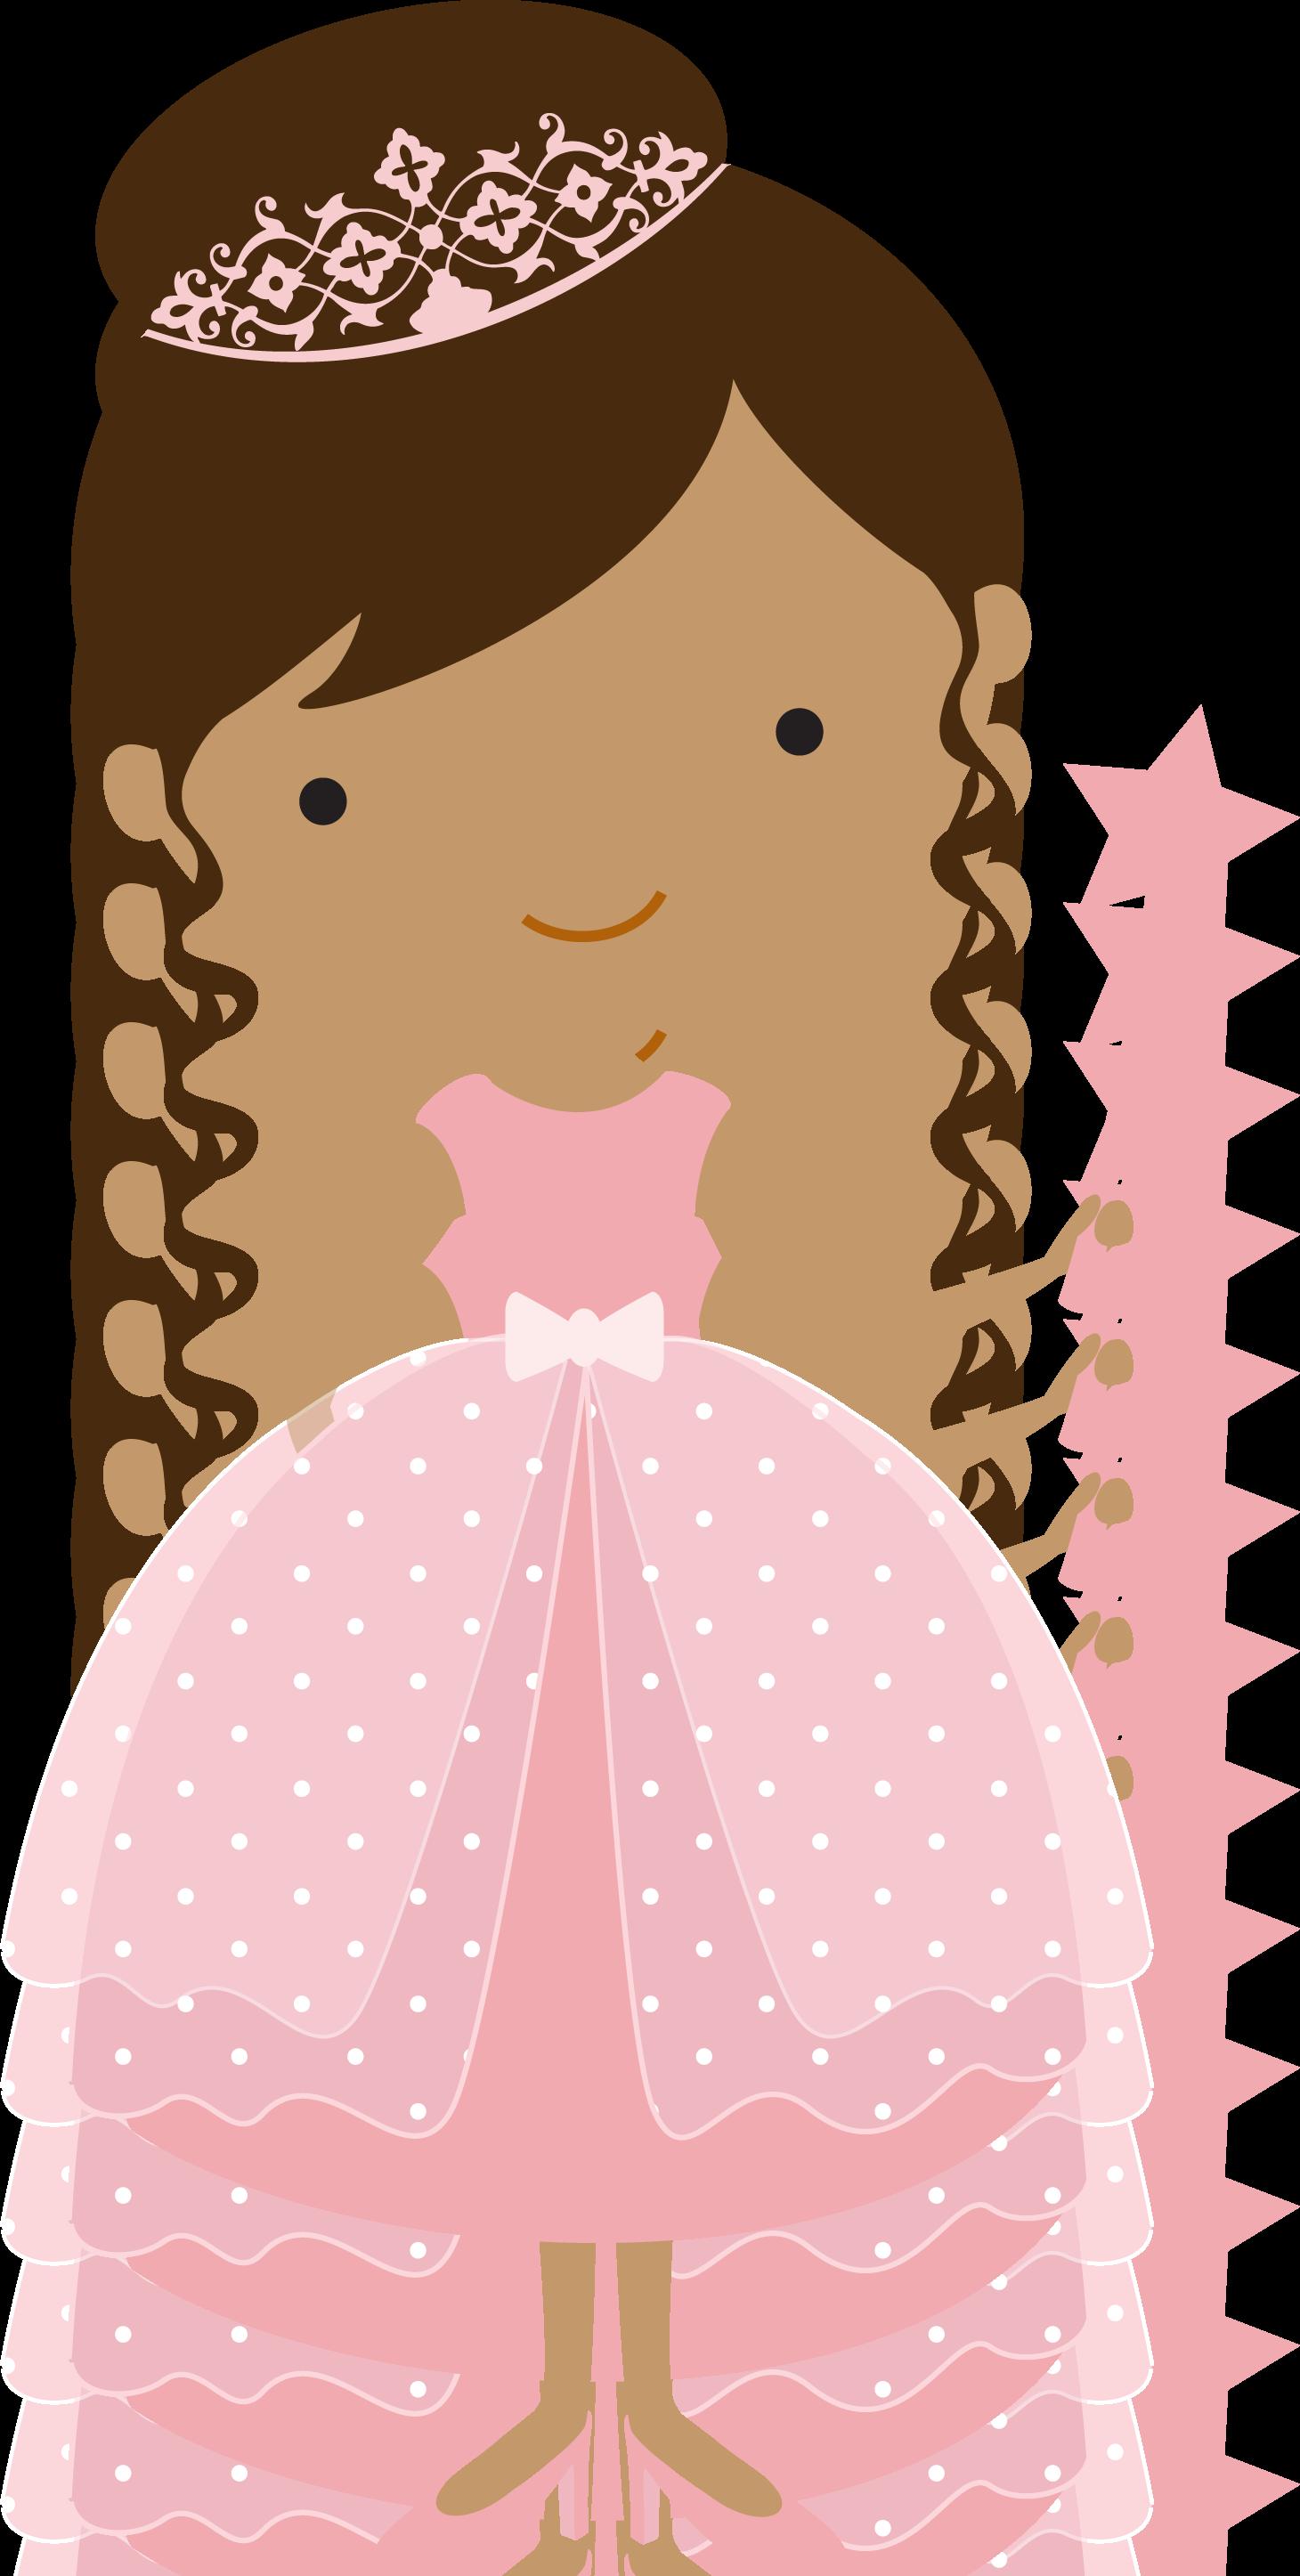 Princesas e fadas pink. Ham clipart noche buena